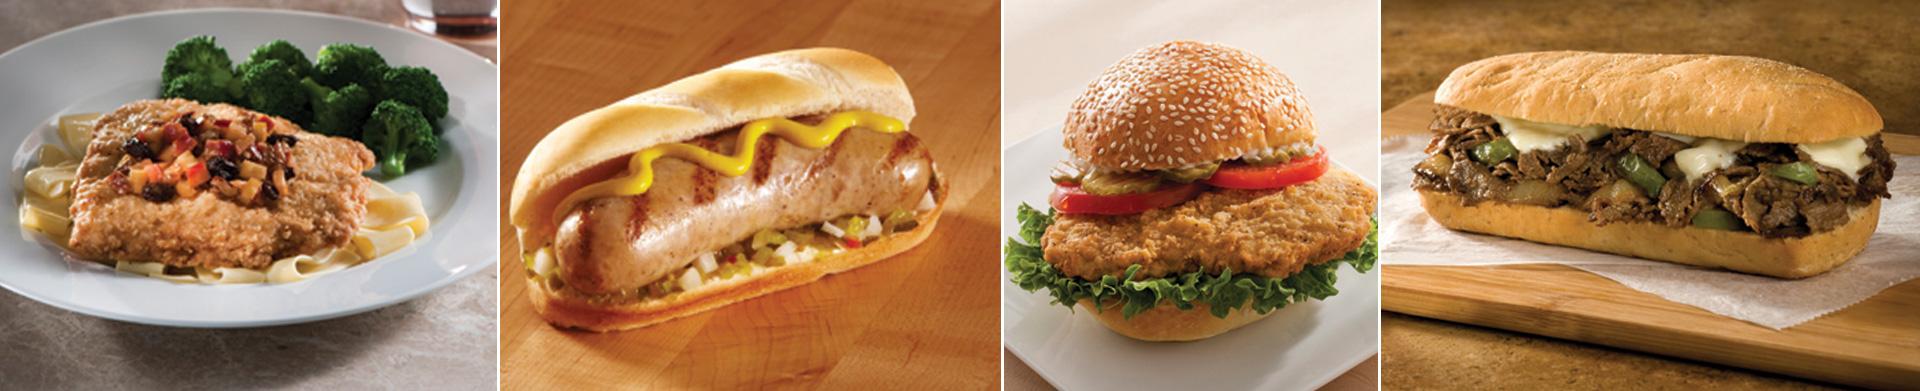 Sandwiches-Meats